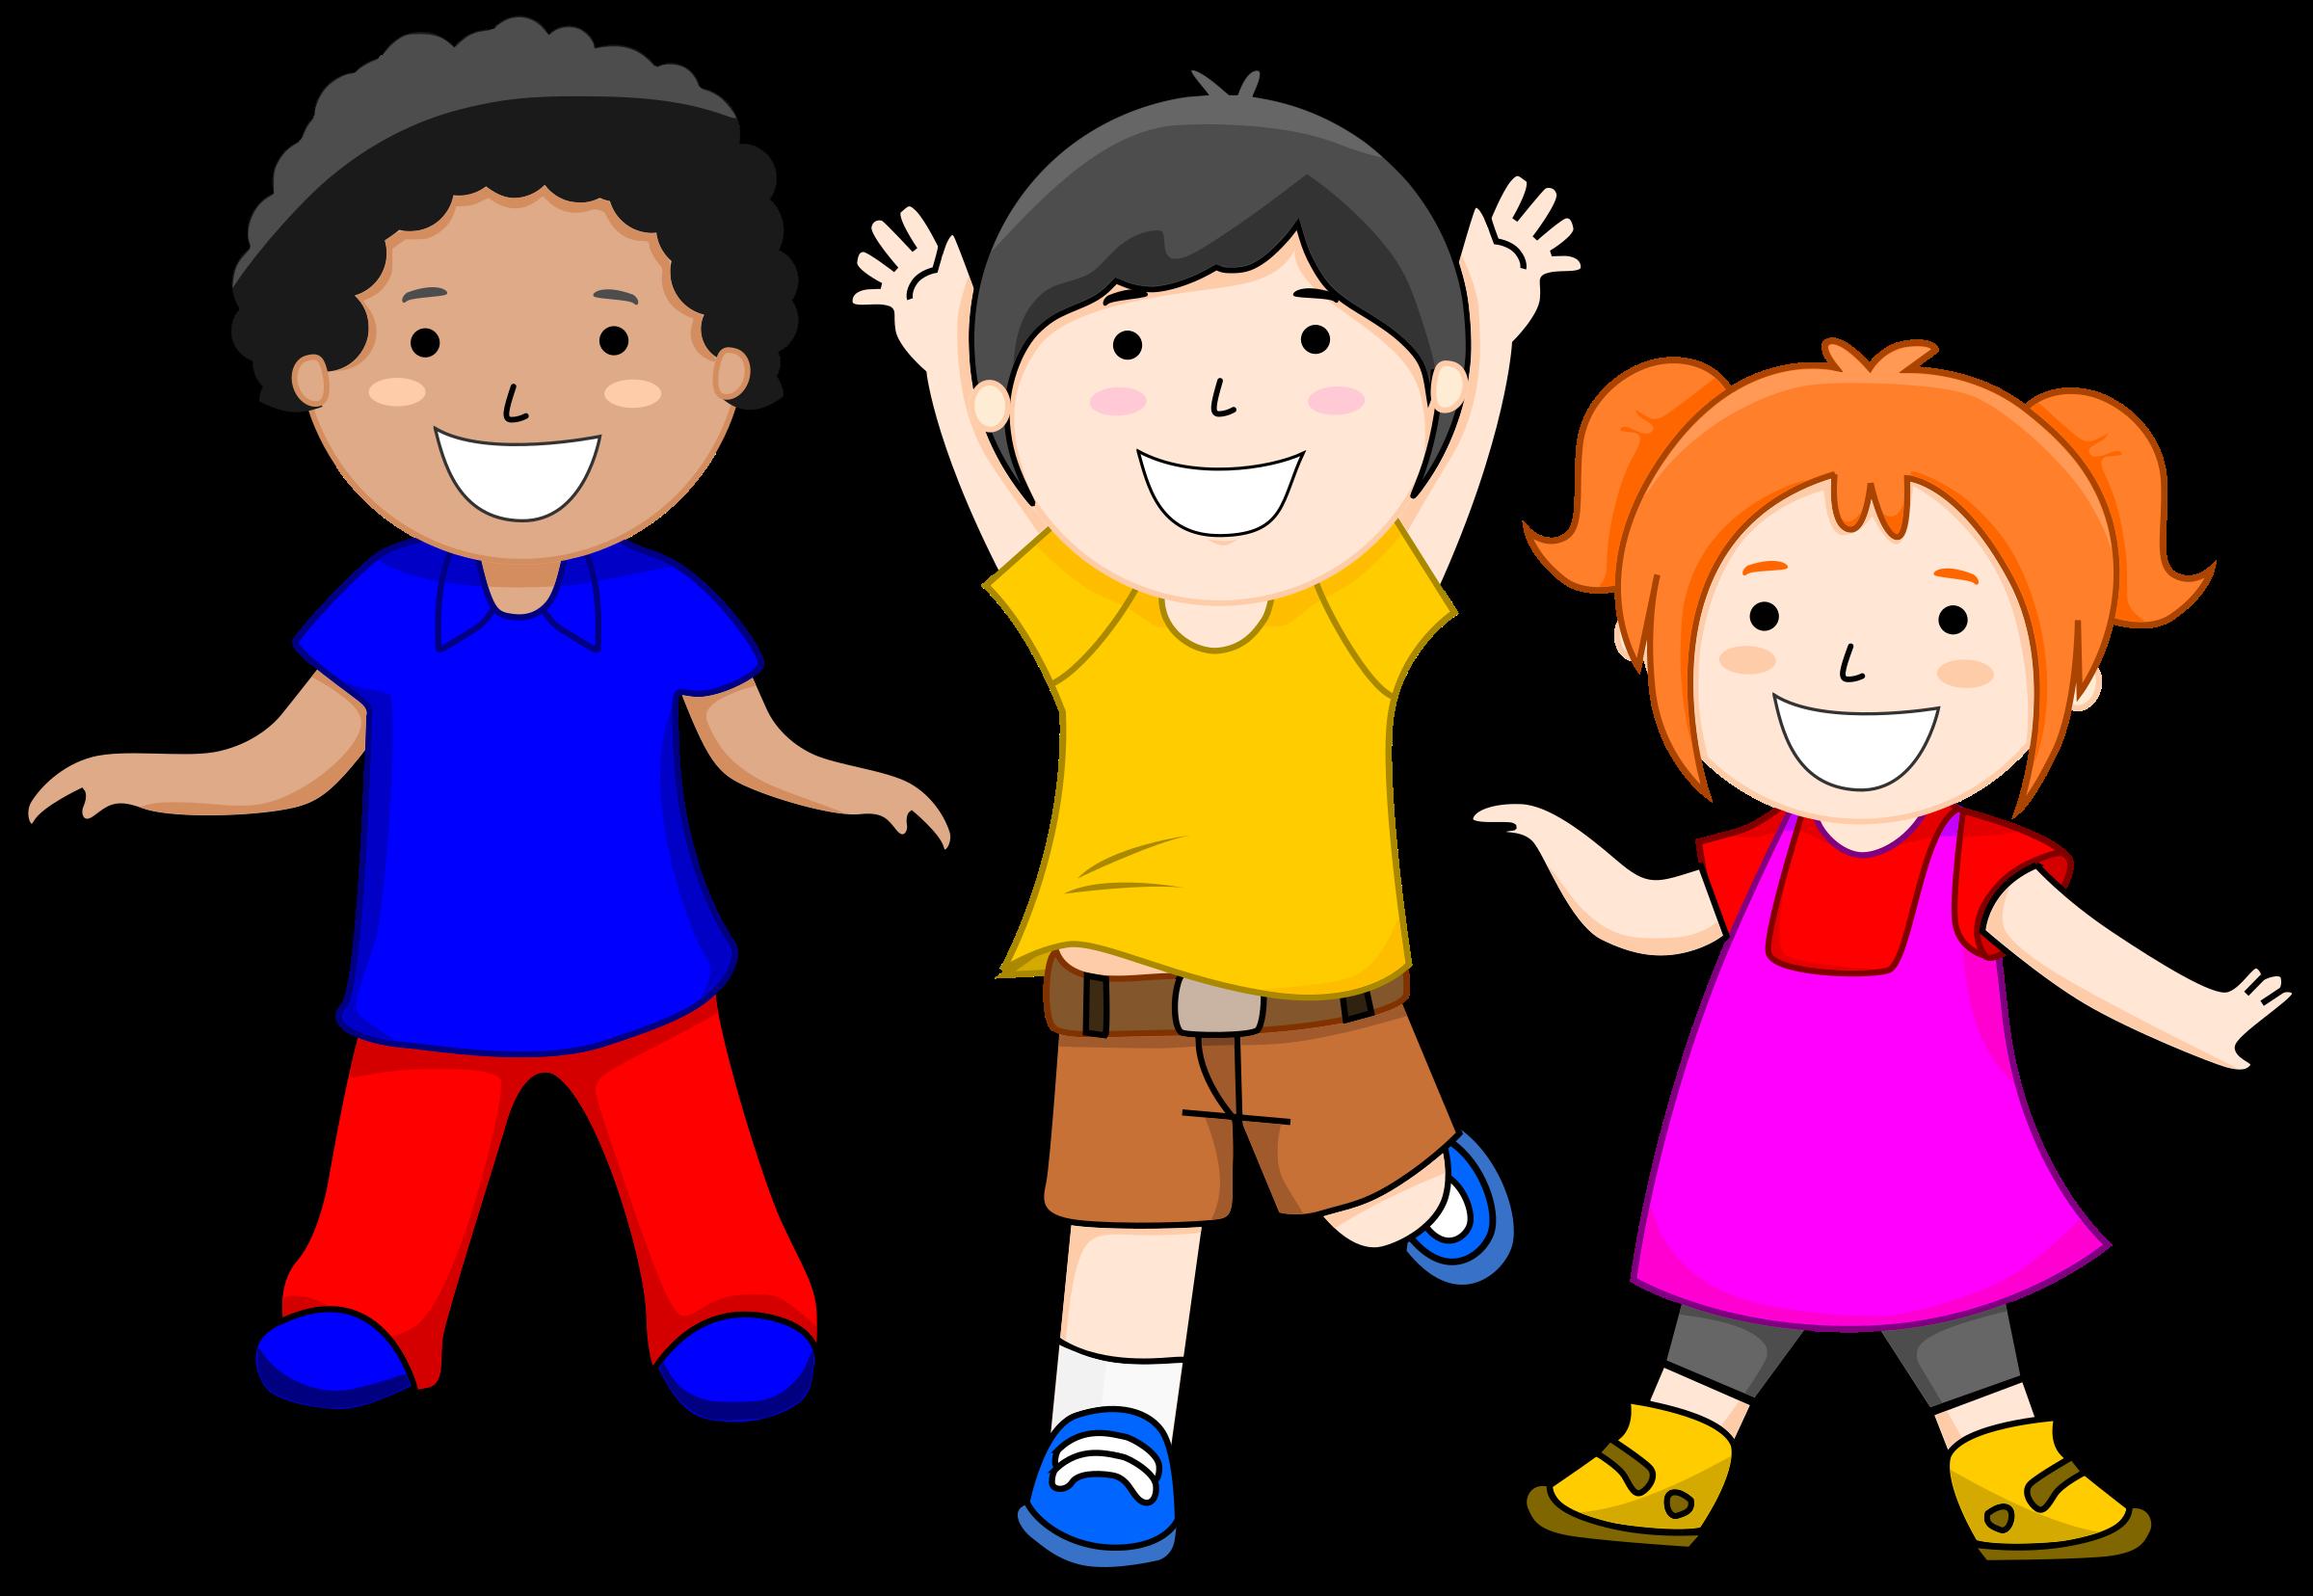 Friendship clipart multicultural. Child by arya wigunavadhana